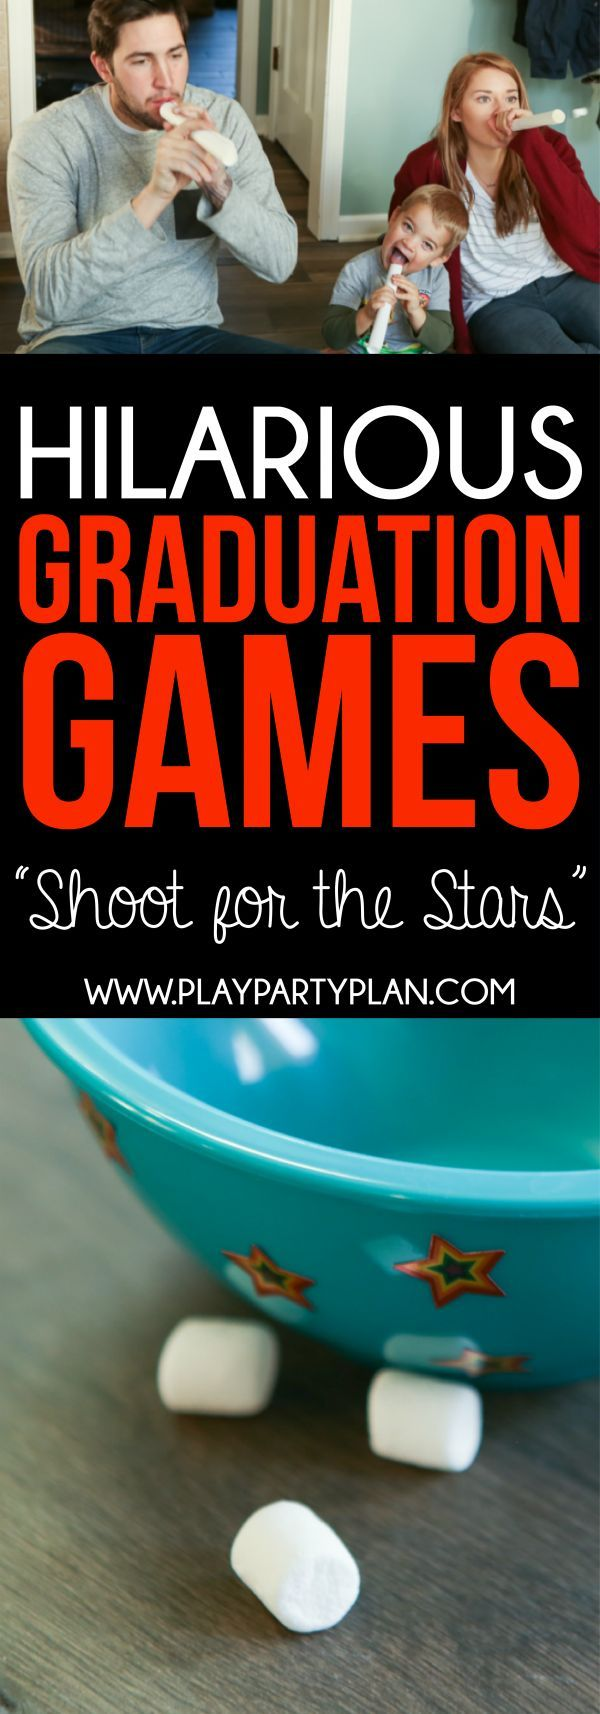 Fullsize Of Graduation Party Games